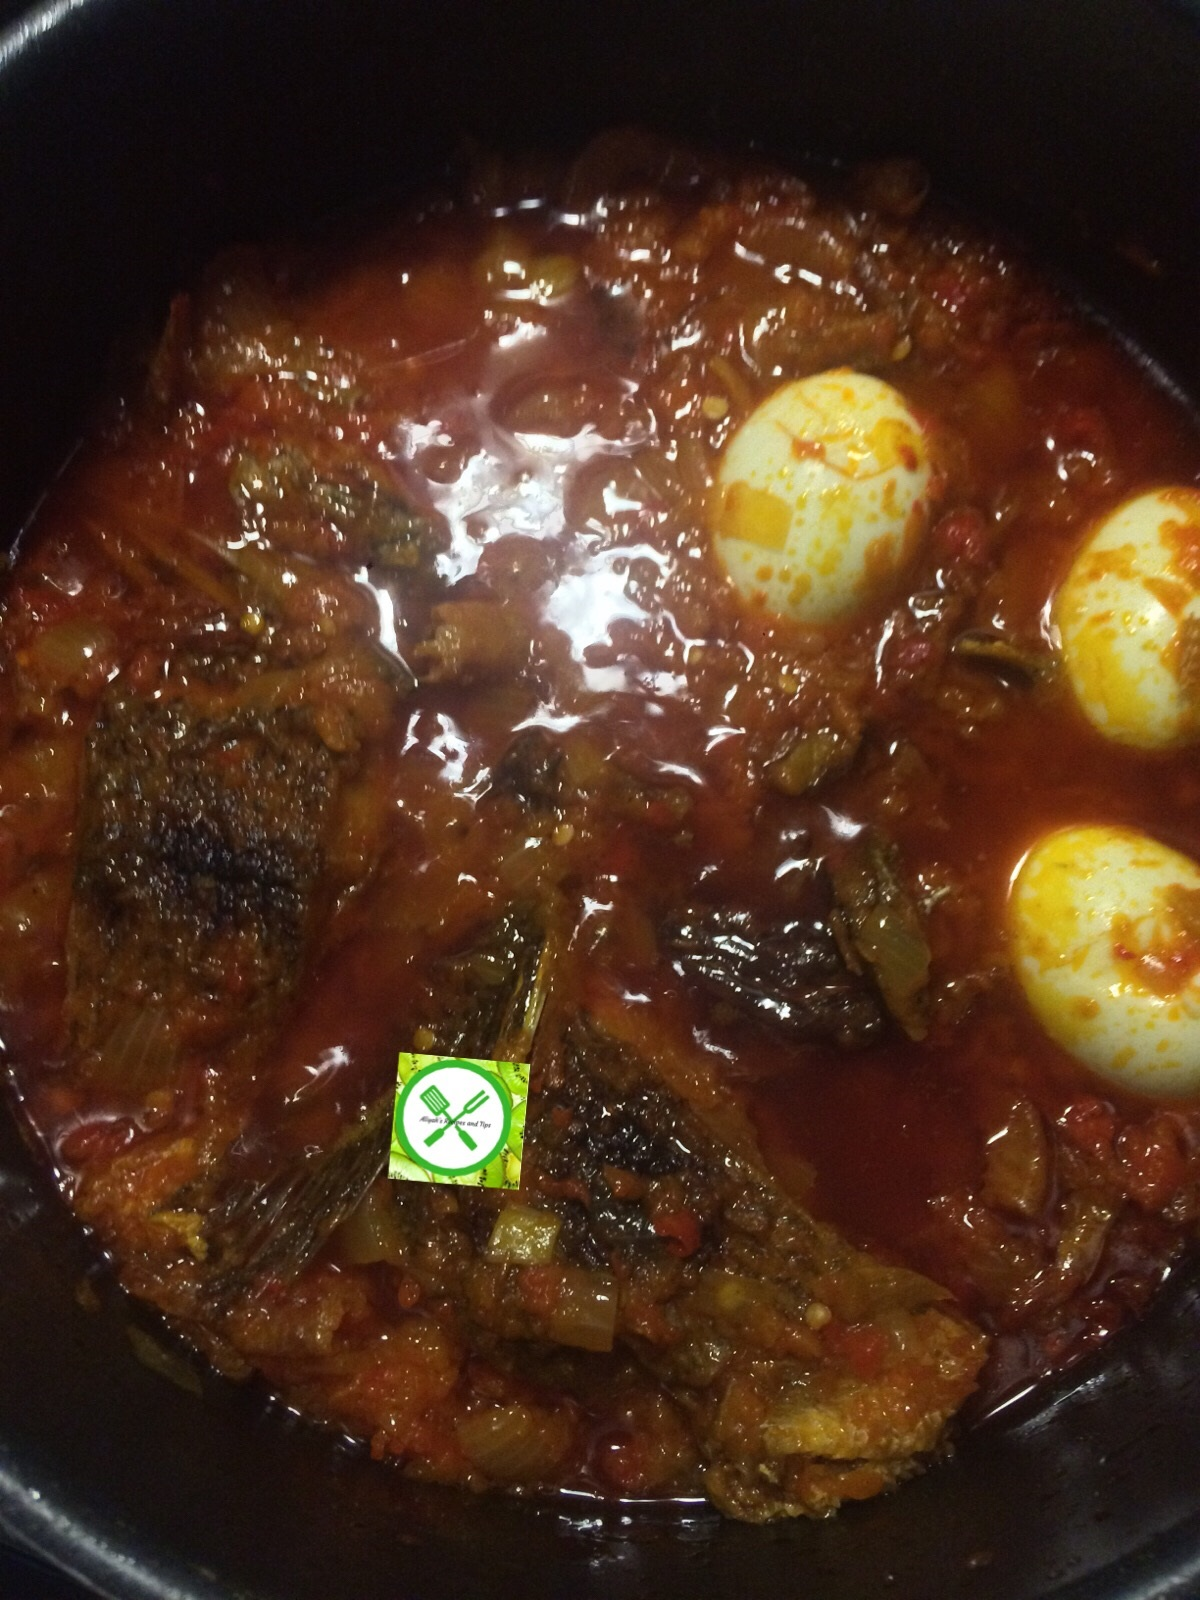 Fried p. oil stew in a pot